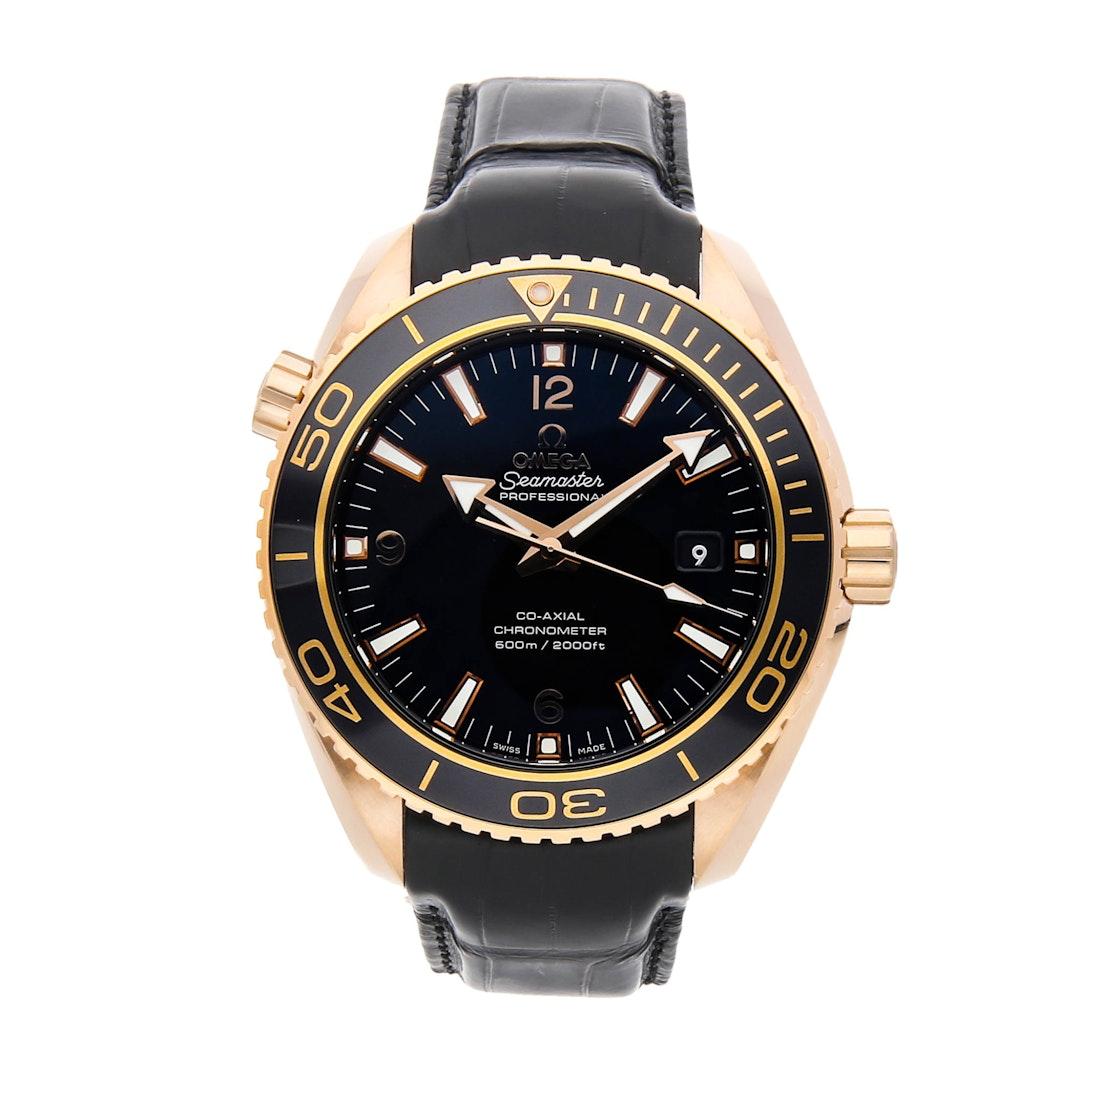 Omega Seamaster Planet Ocean 600m 232.63.46.21.01.001